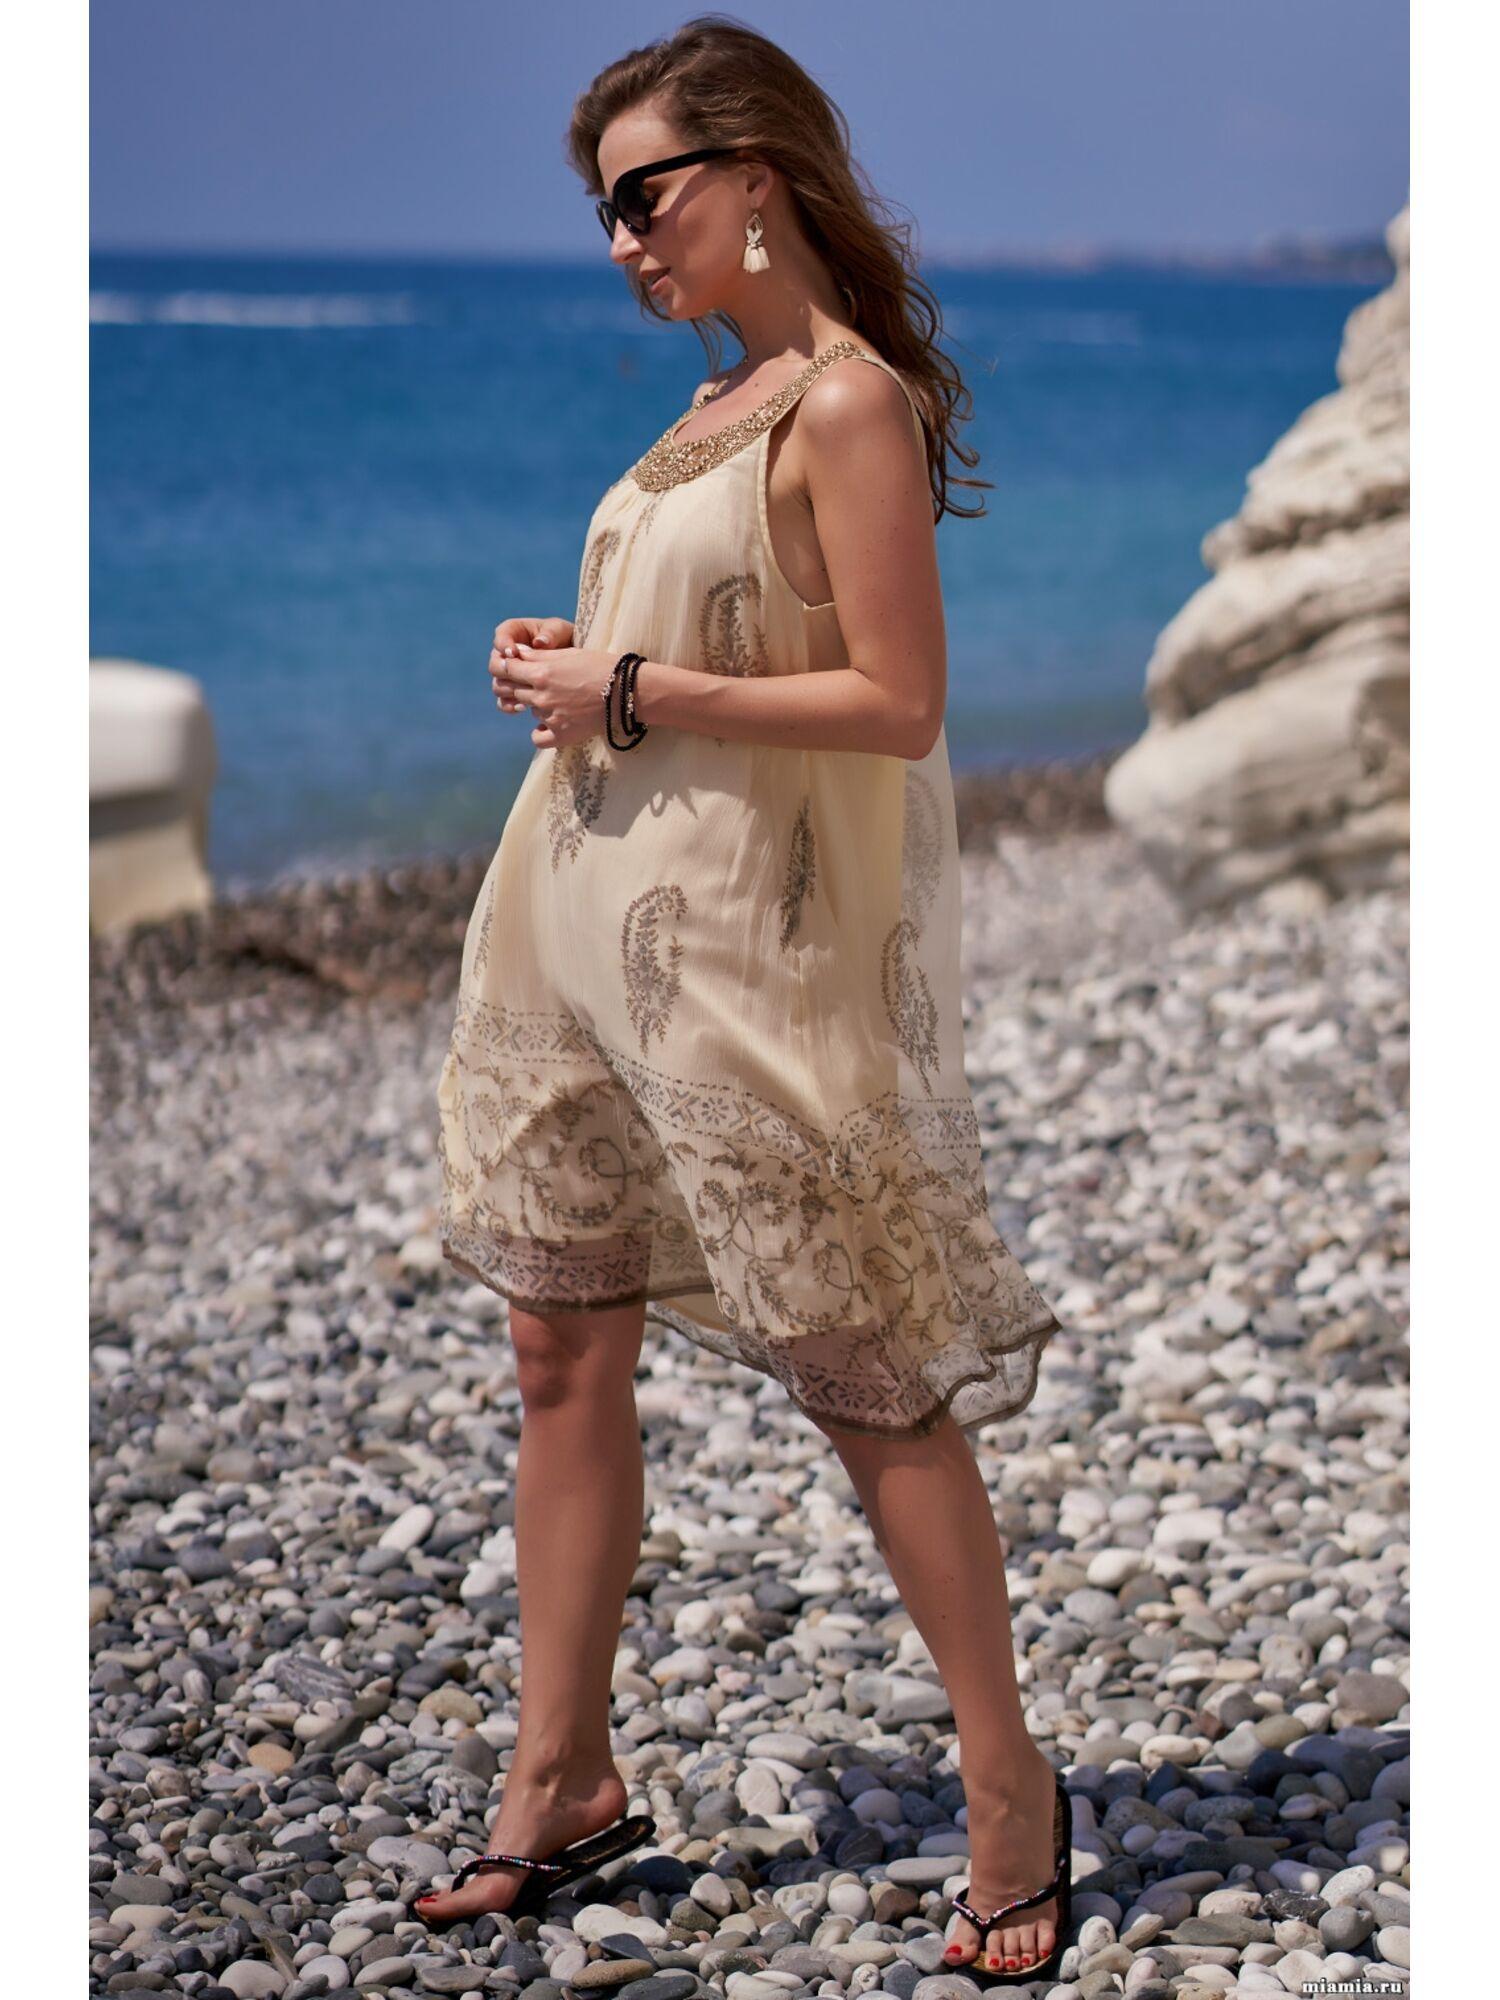 Сарафан, туника пляжная хлопковая Доминикана 1407, бежевый, Mia-Amore